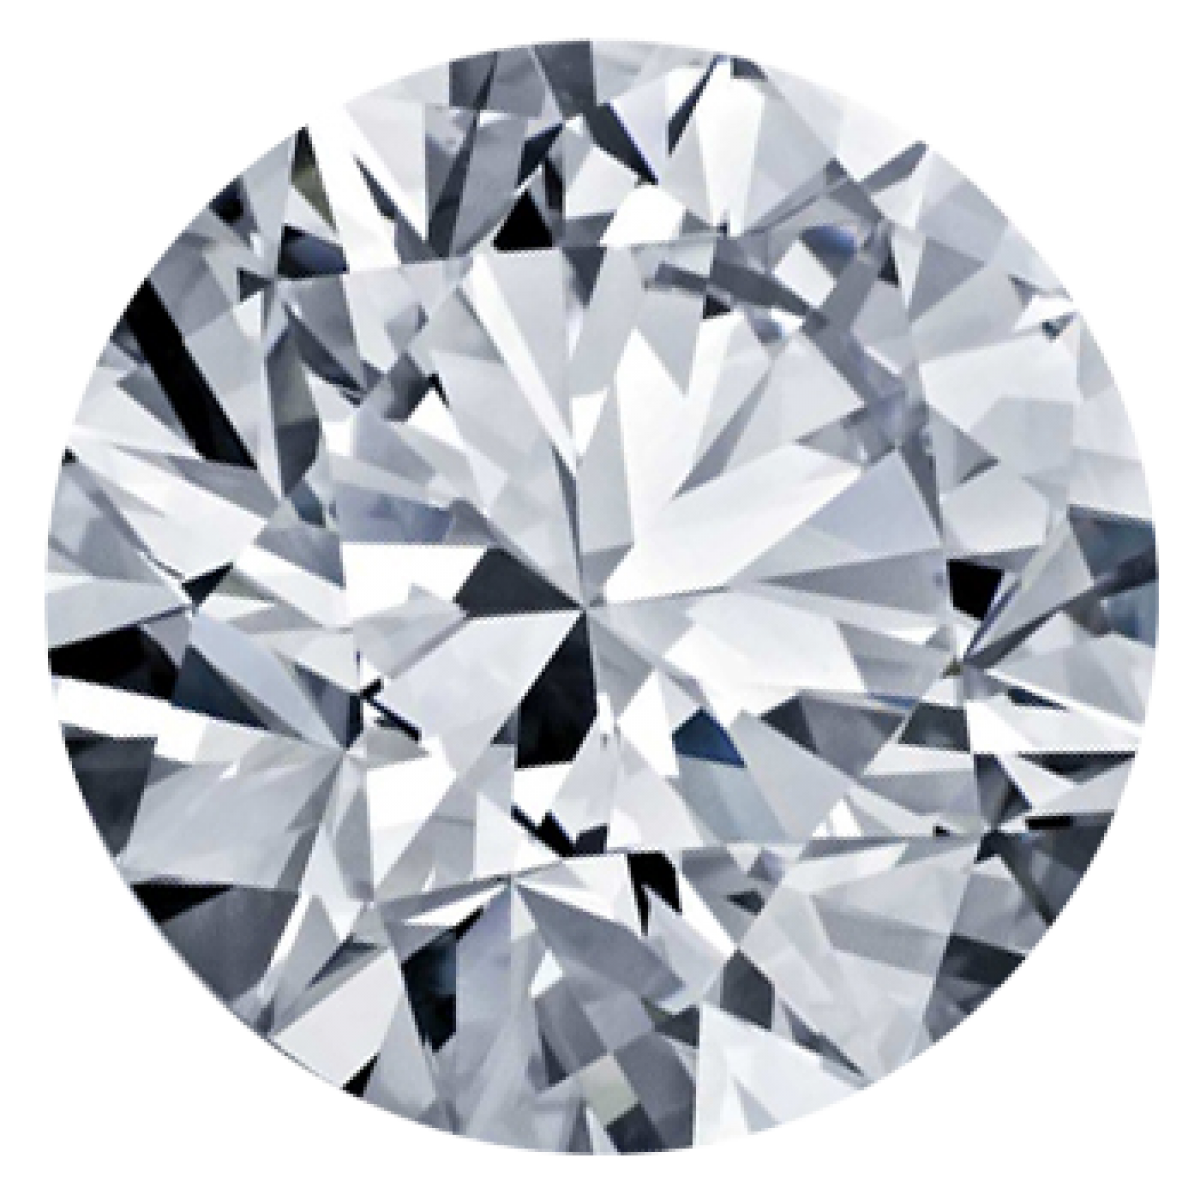 0.58CT Round I I1 Lab Grown Diamond 0020